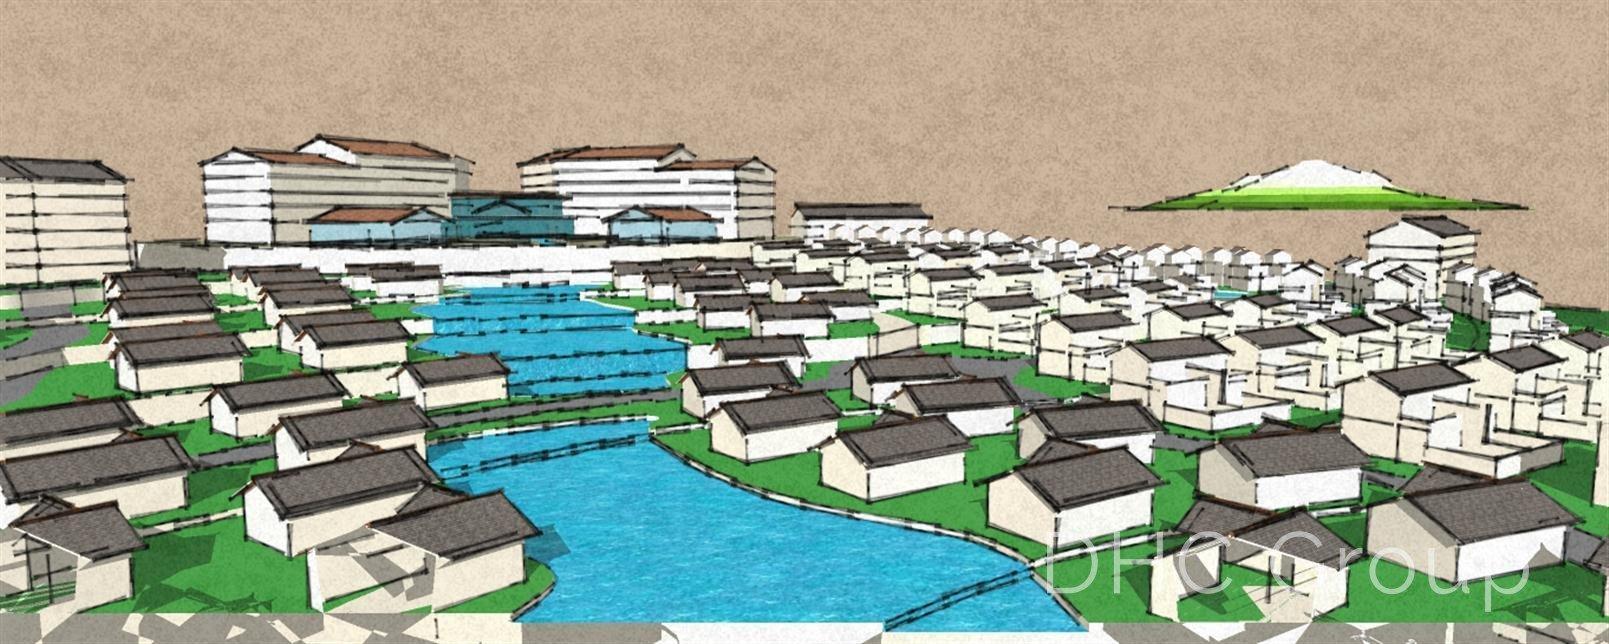 yunnan province lijang wenbi tourist recreational district project9